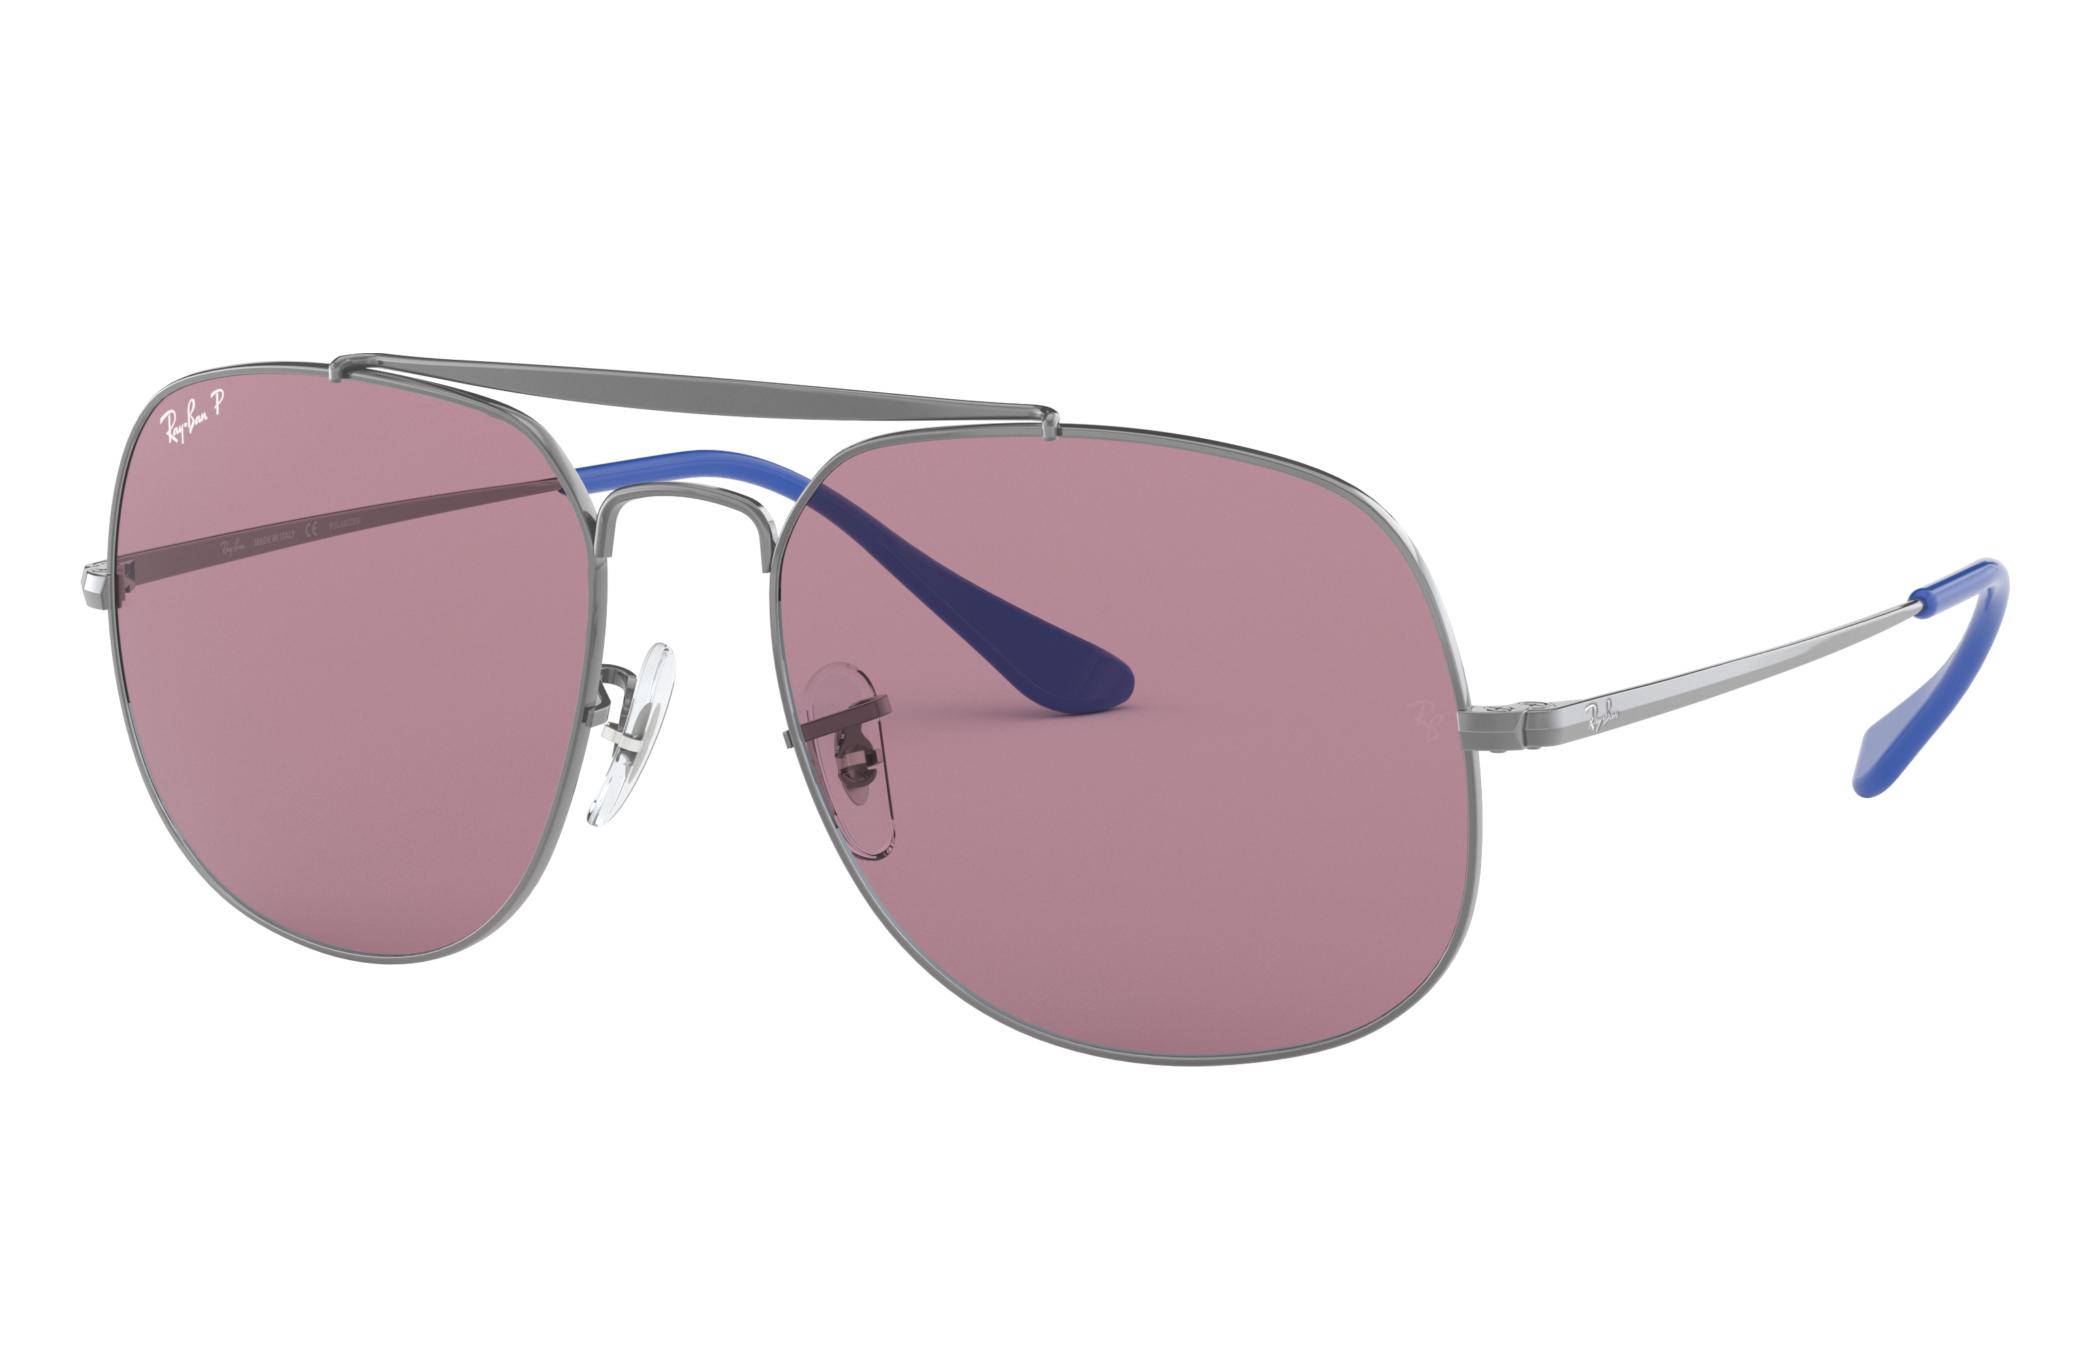 Ray-Ban General Pop Gunmetal, Polarized Violet Lenses - RB3561